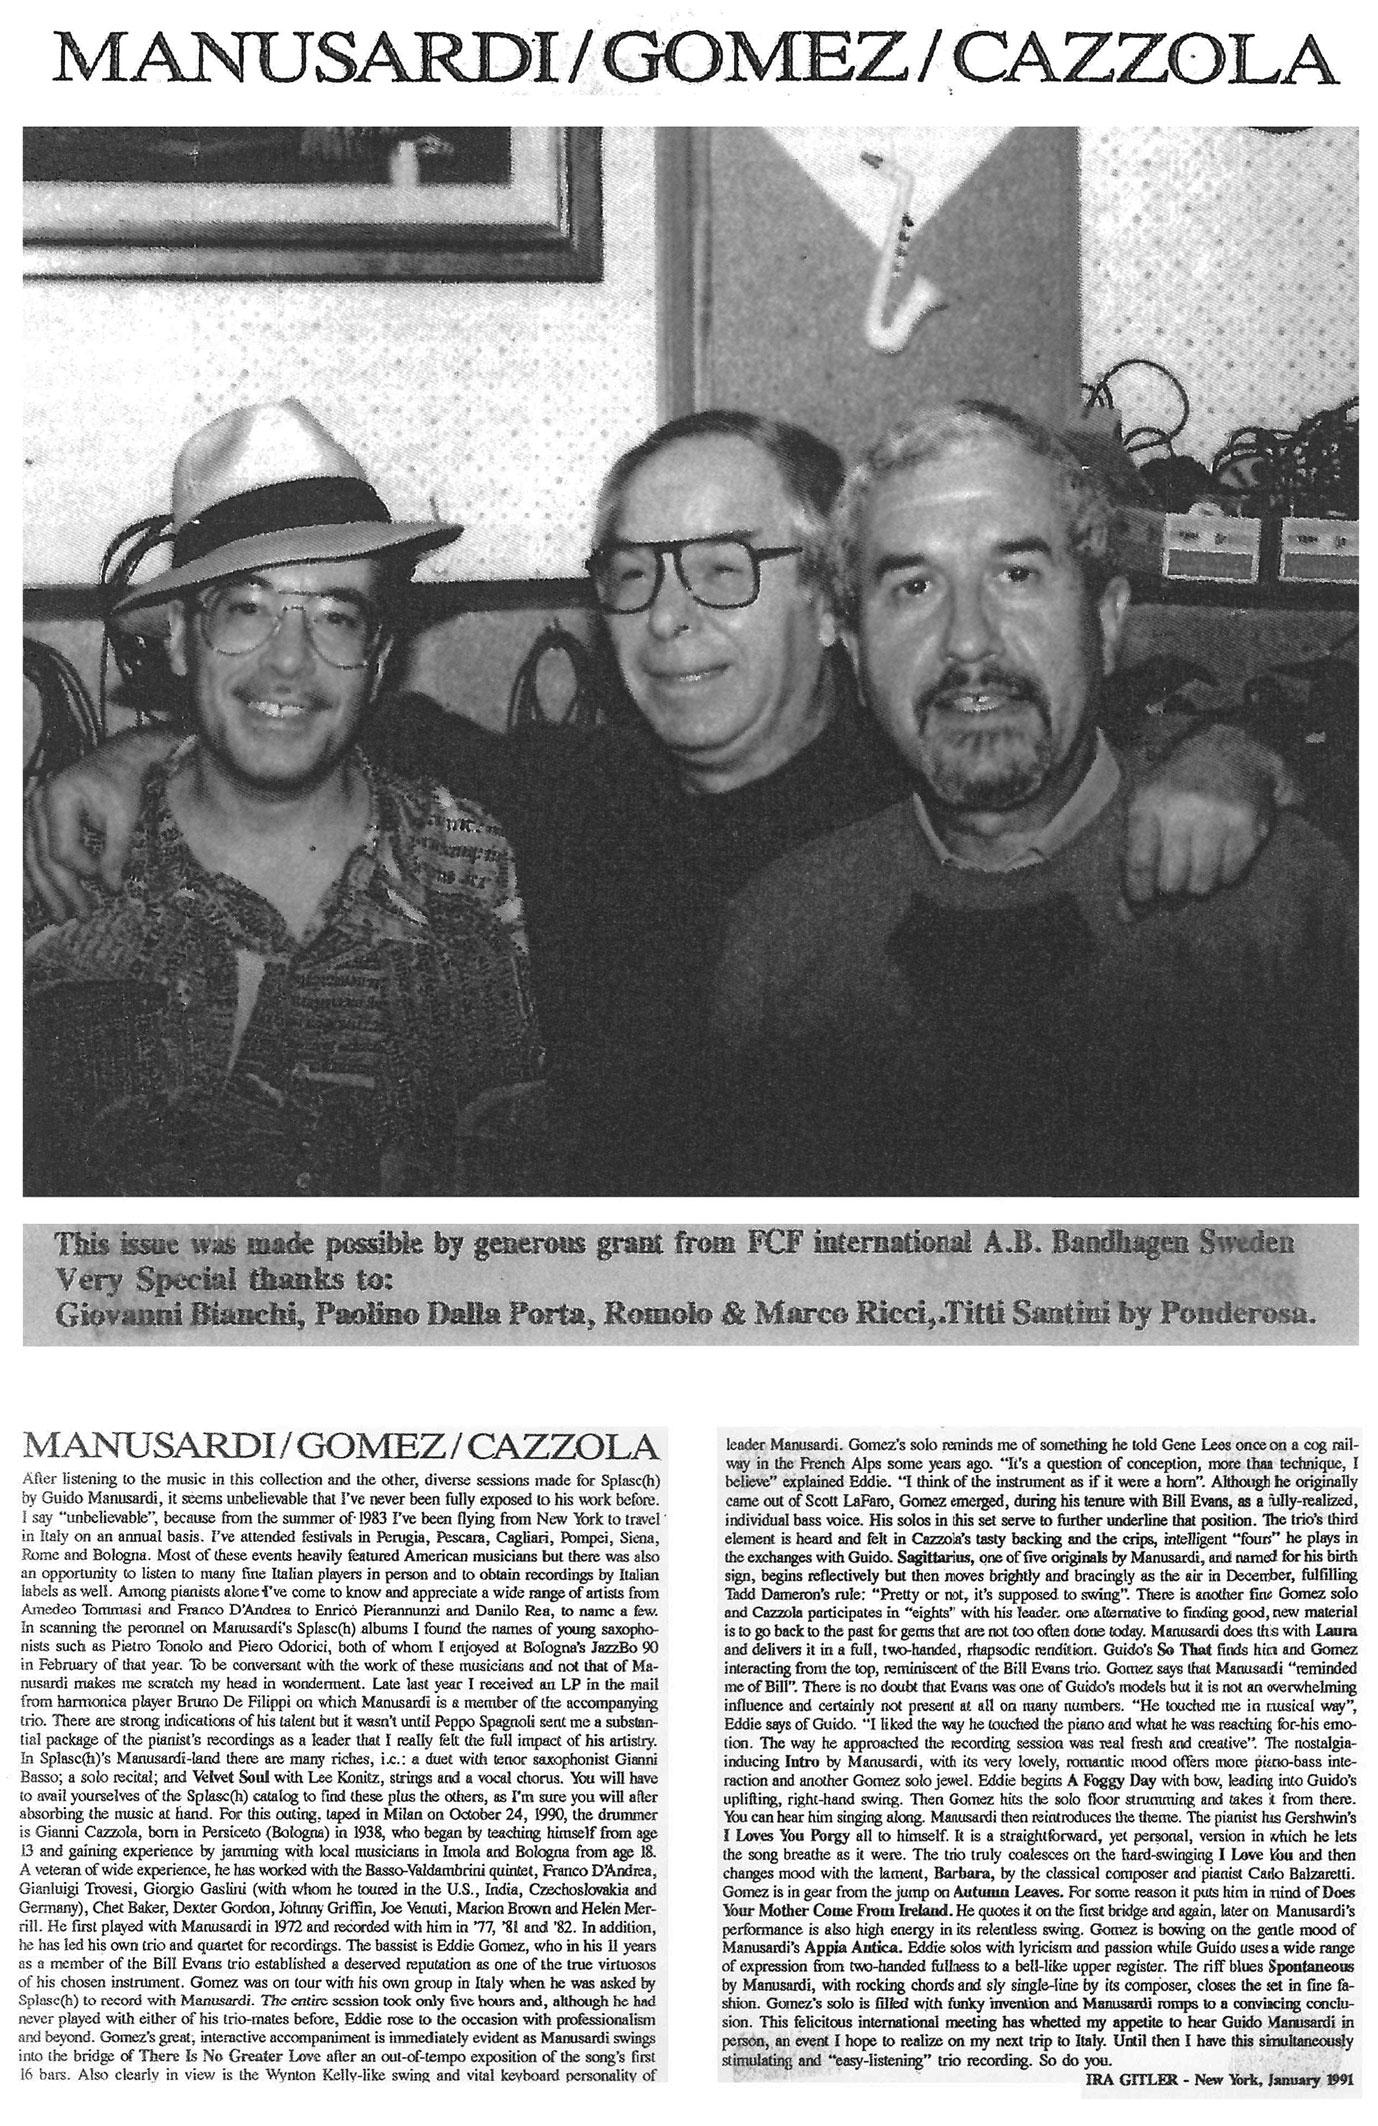 MANUSARDI / GOMEZ / CAZZOLLA NEW YORK 1991